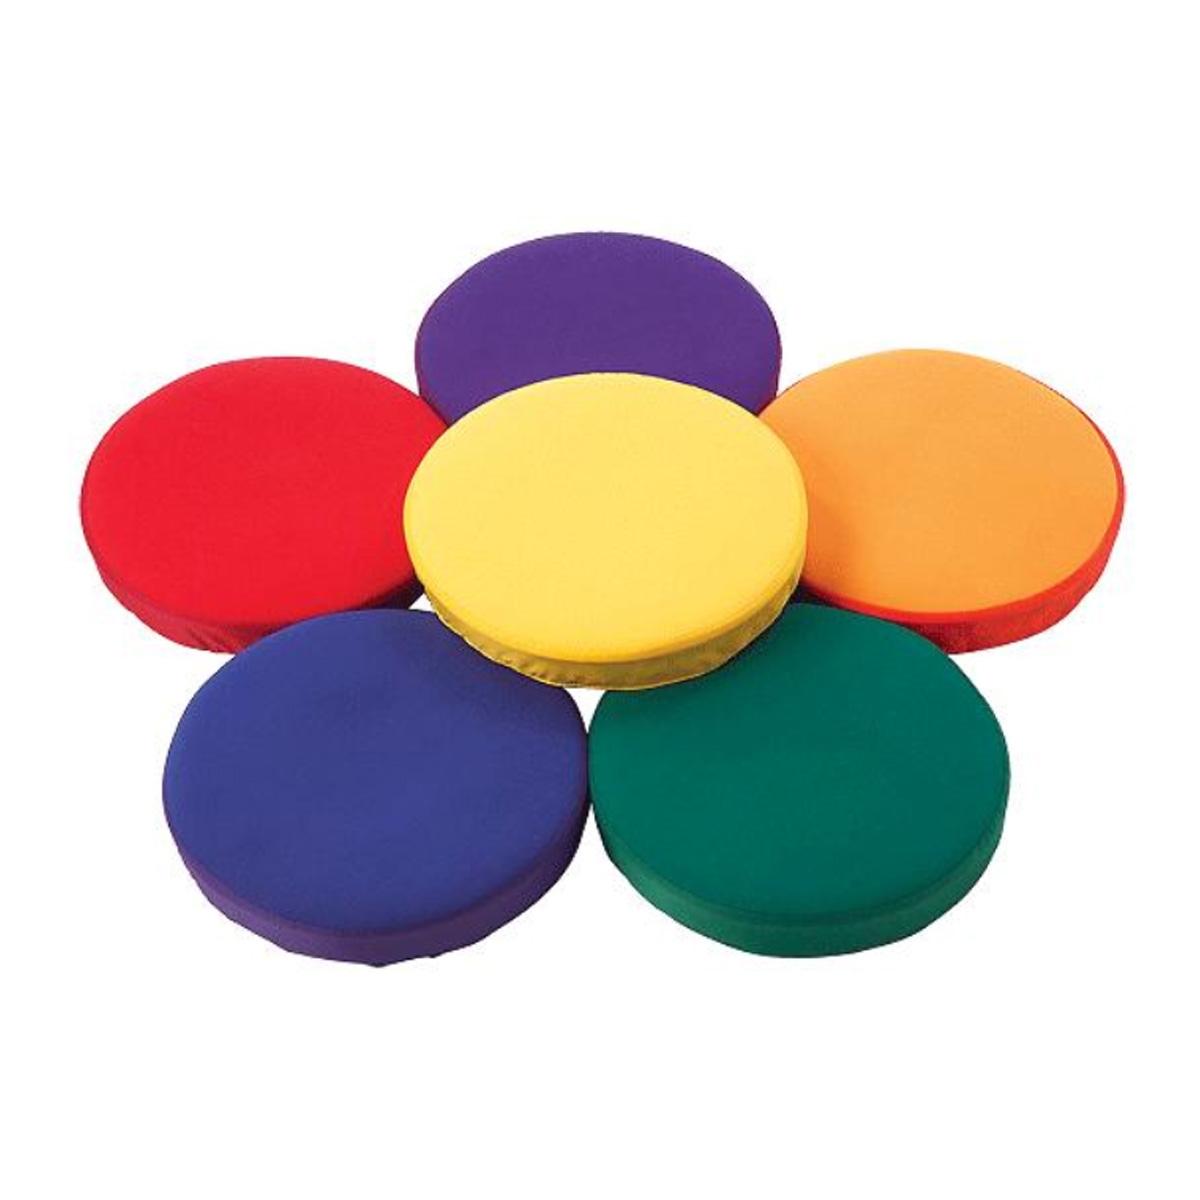 set of 6 colorful step sensory pads